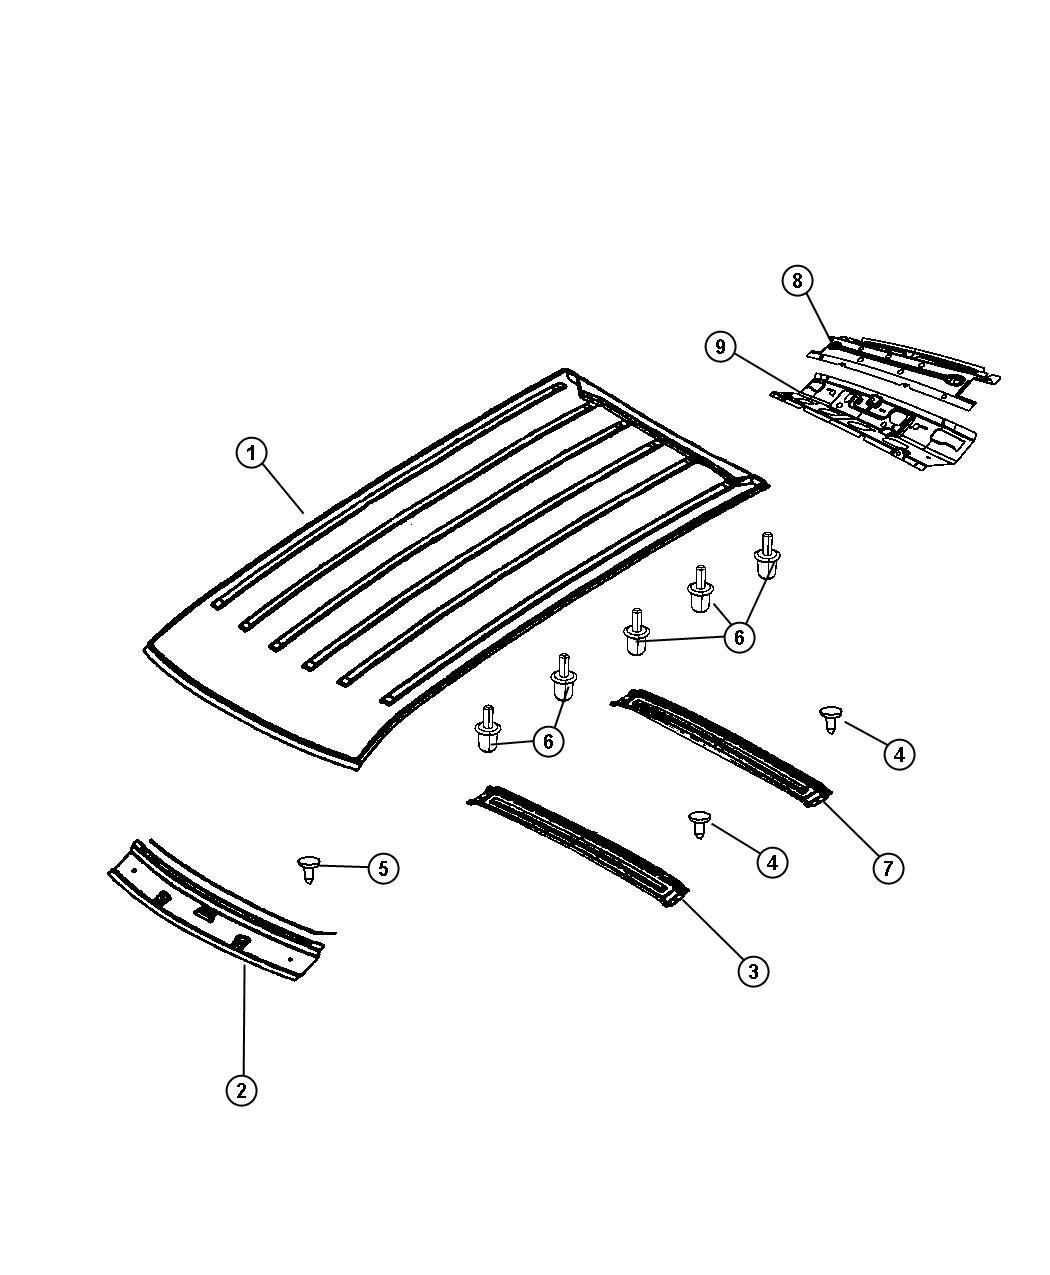 Dodge Nitro Panel Roof Without Power Sunroof